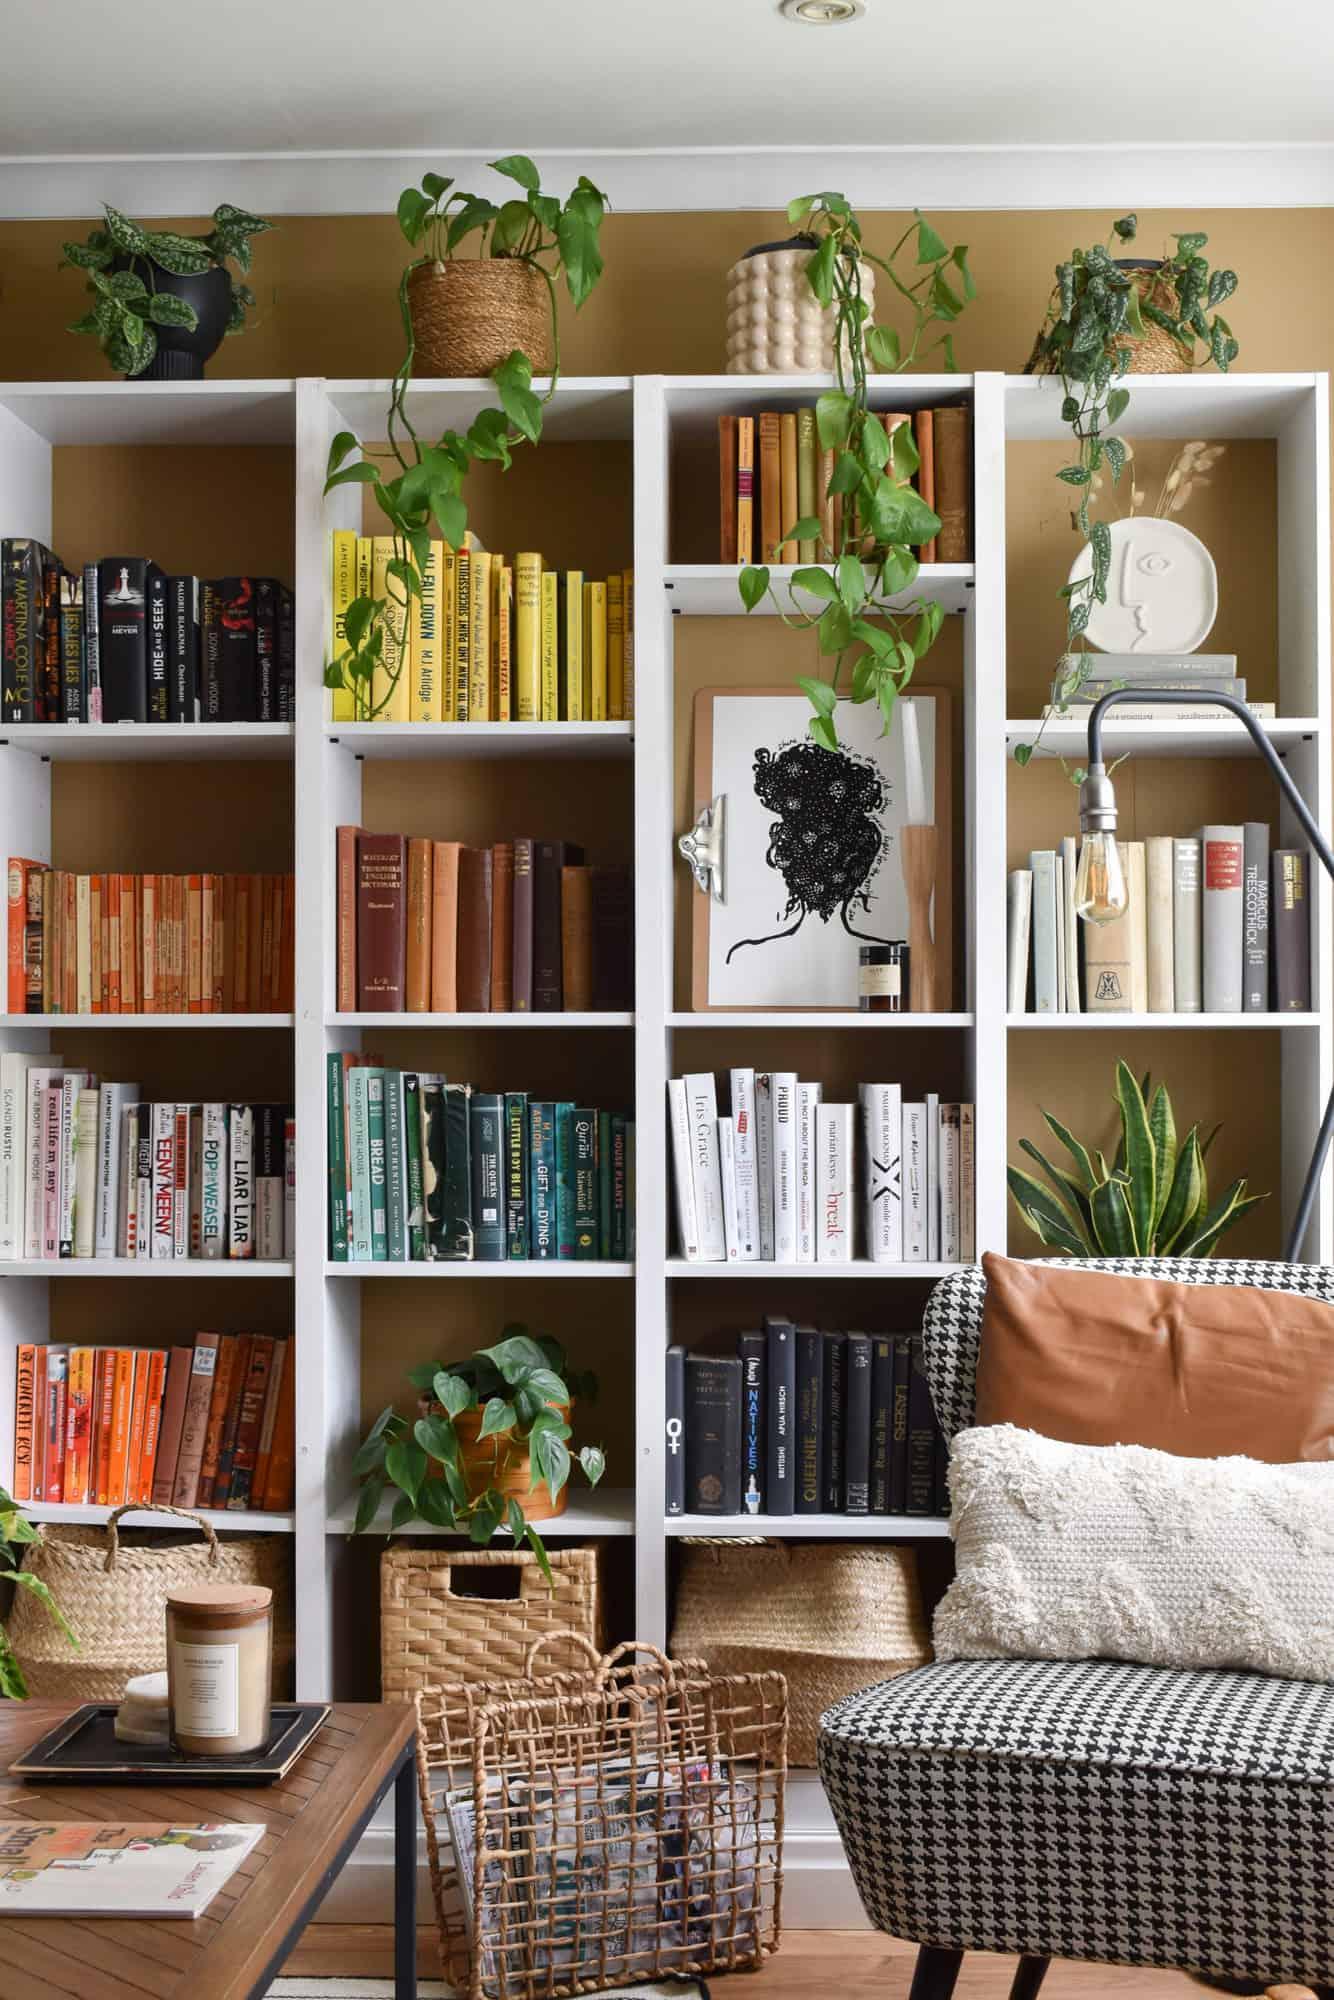 A colorful rainbow book shelf